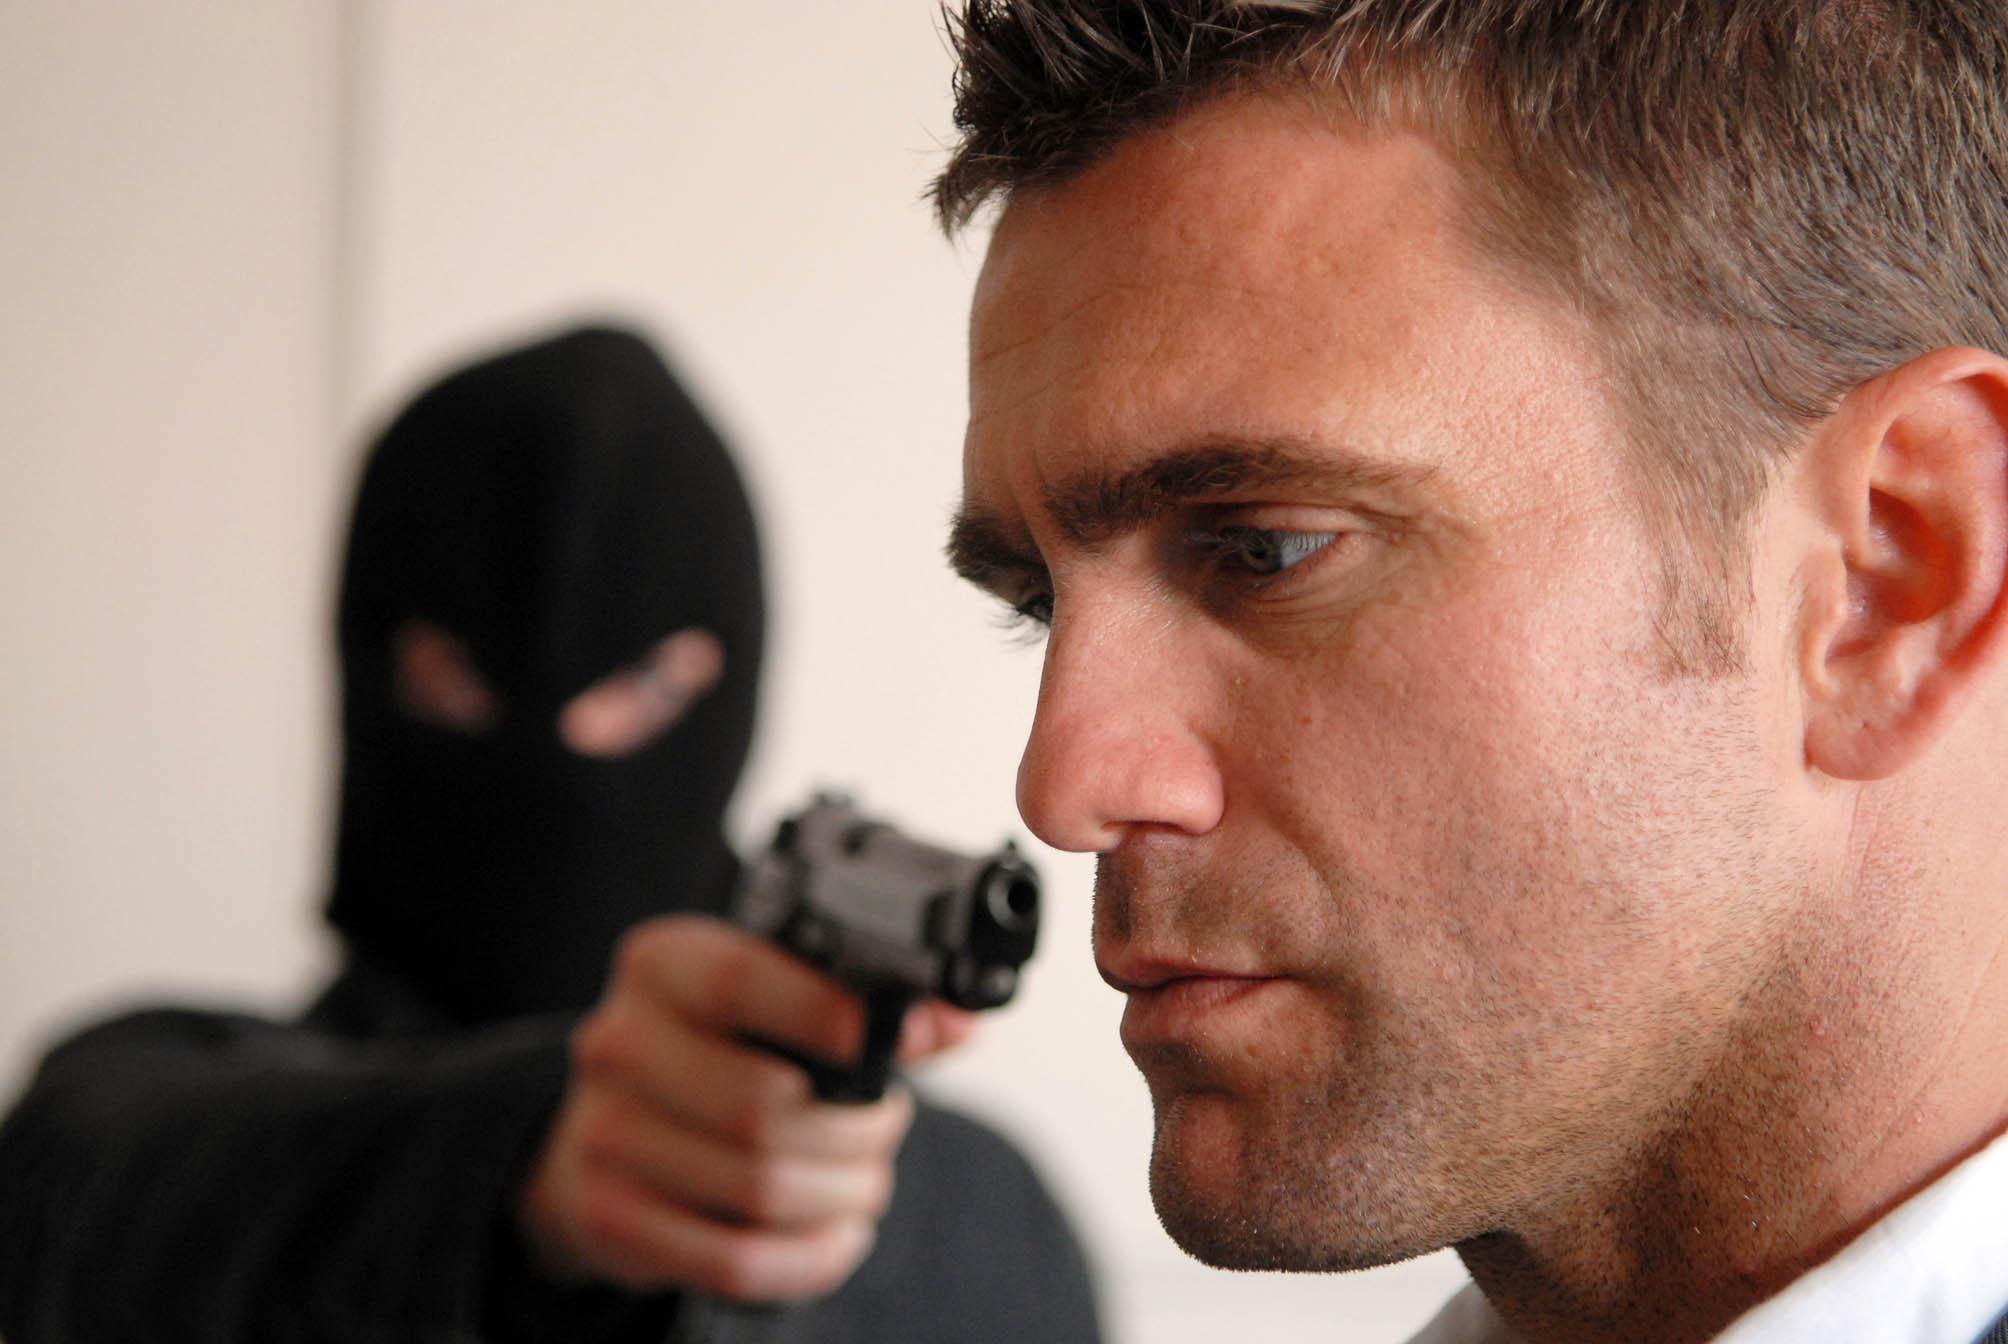 Phil's held at gunpoint